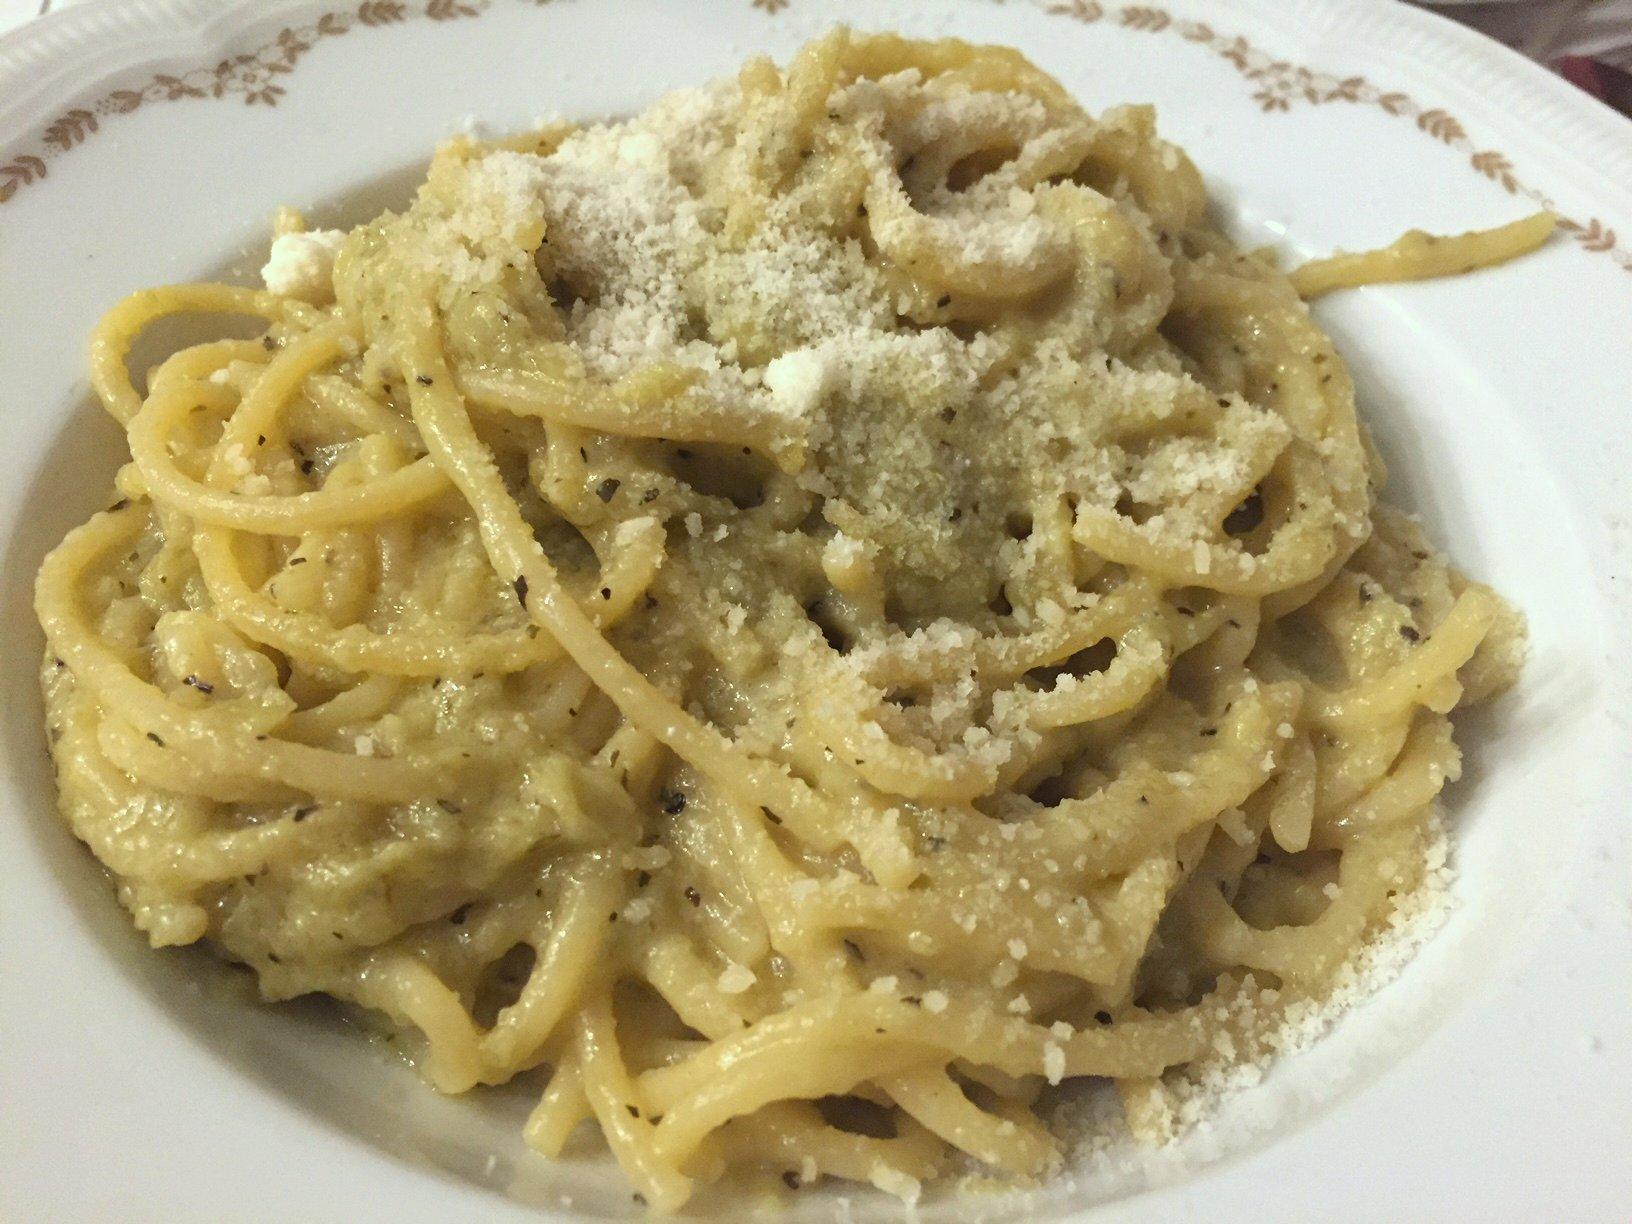 Spghetti with artichoke cream and mint. Bellissima! My dinner tonight.